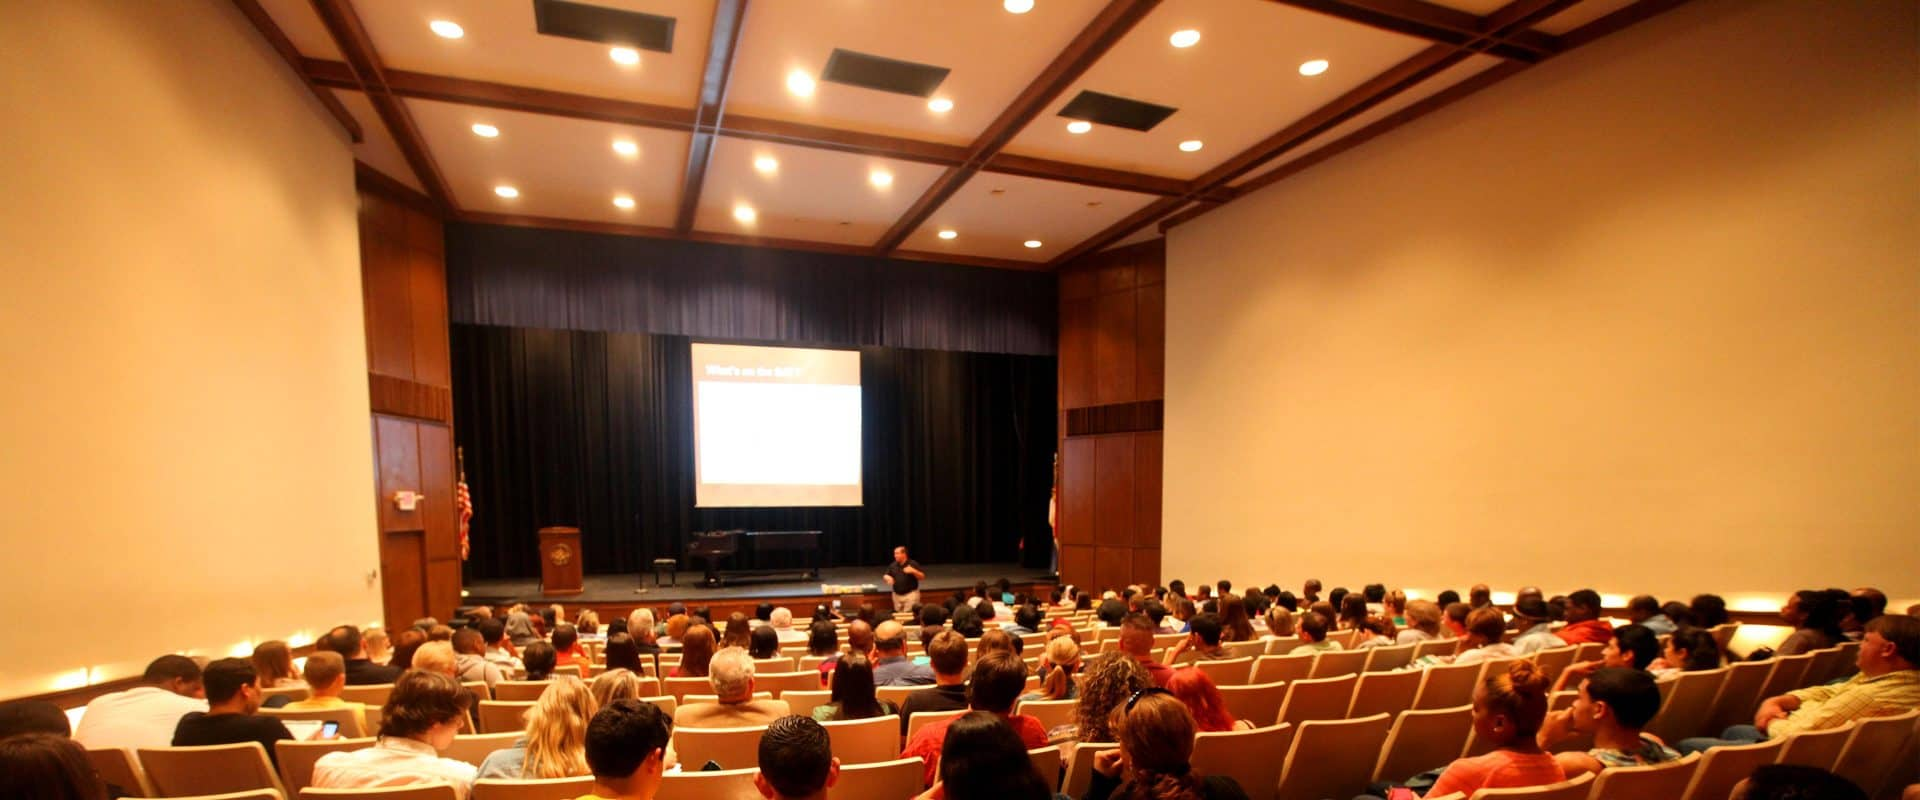 Kenan Theatre on WPU campus.